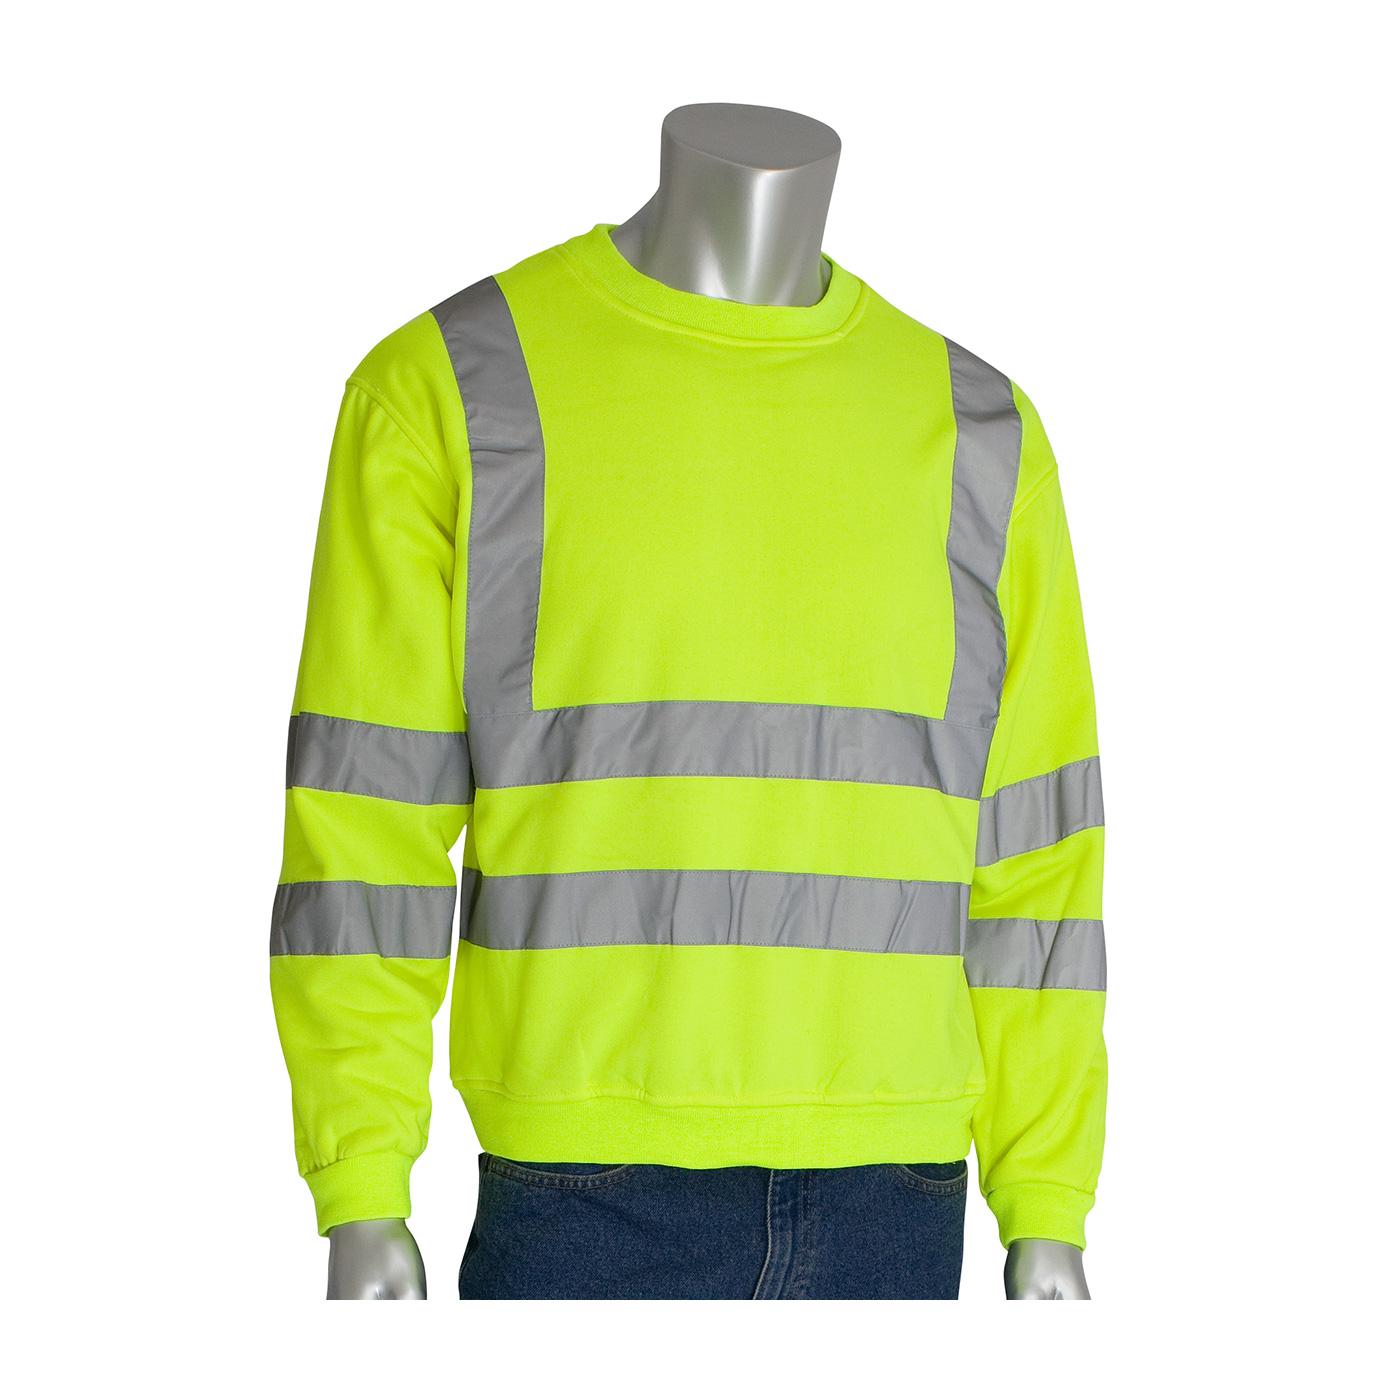 ANSI Type R Class 3 Crew Neck Sweatshirt, Hi-Vis Yellow, XL